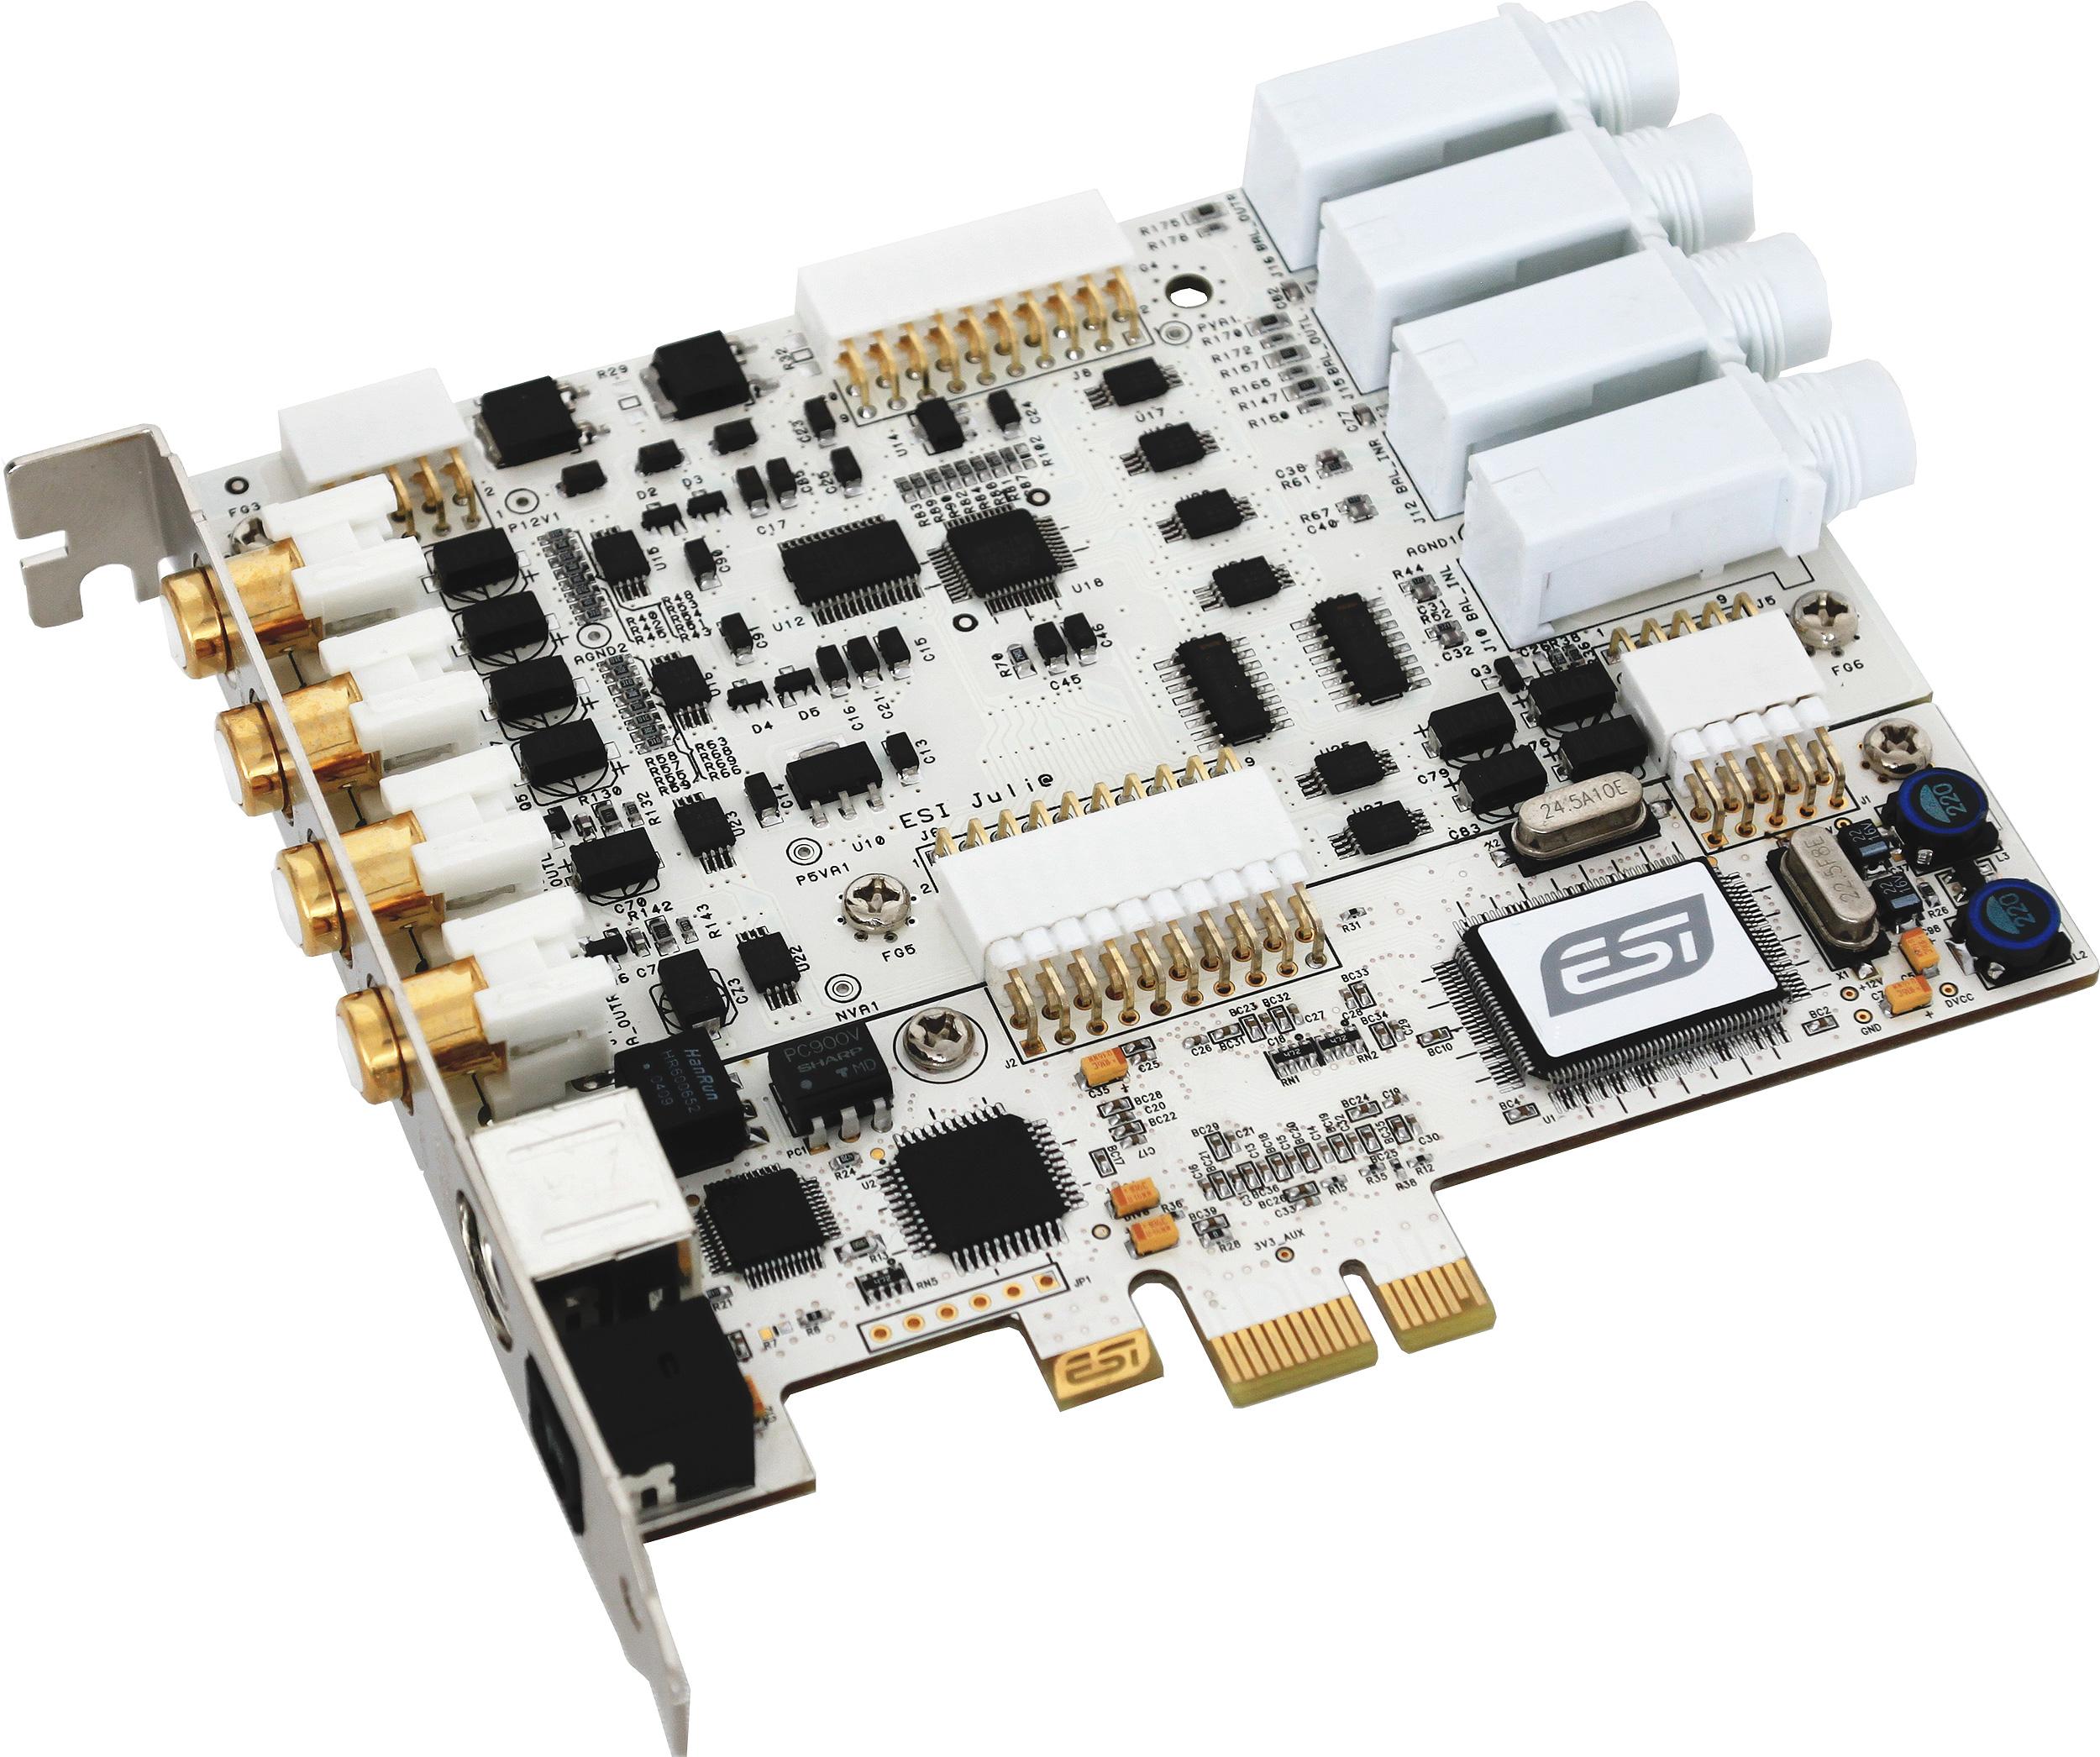 Juli@ XTe是PCIe版本的Juli@,提供24bit/192kHz的高精度音频,最特别的就是可以更换接口的设计,可自由选择使用RCA莲花接口还是TRS大三芯接口。同时内置了MIDI输入输出和数字输入输出接口。 Juli@ XTe主要特性: